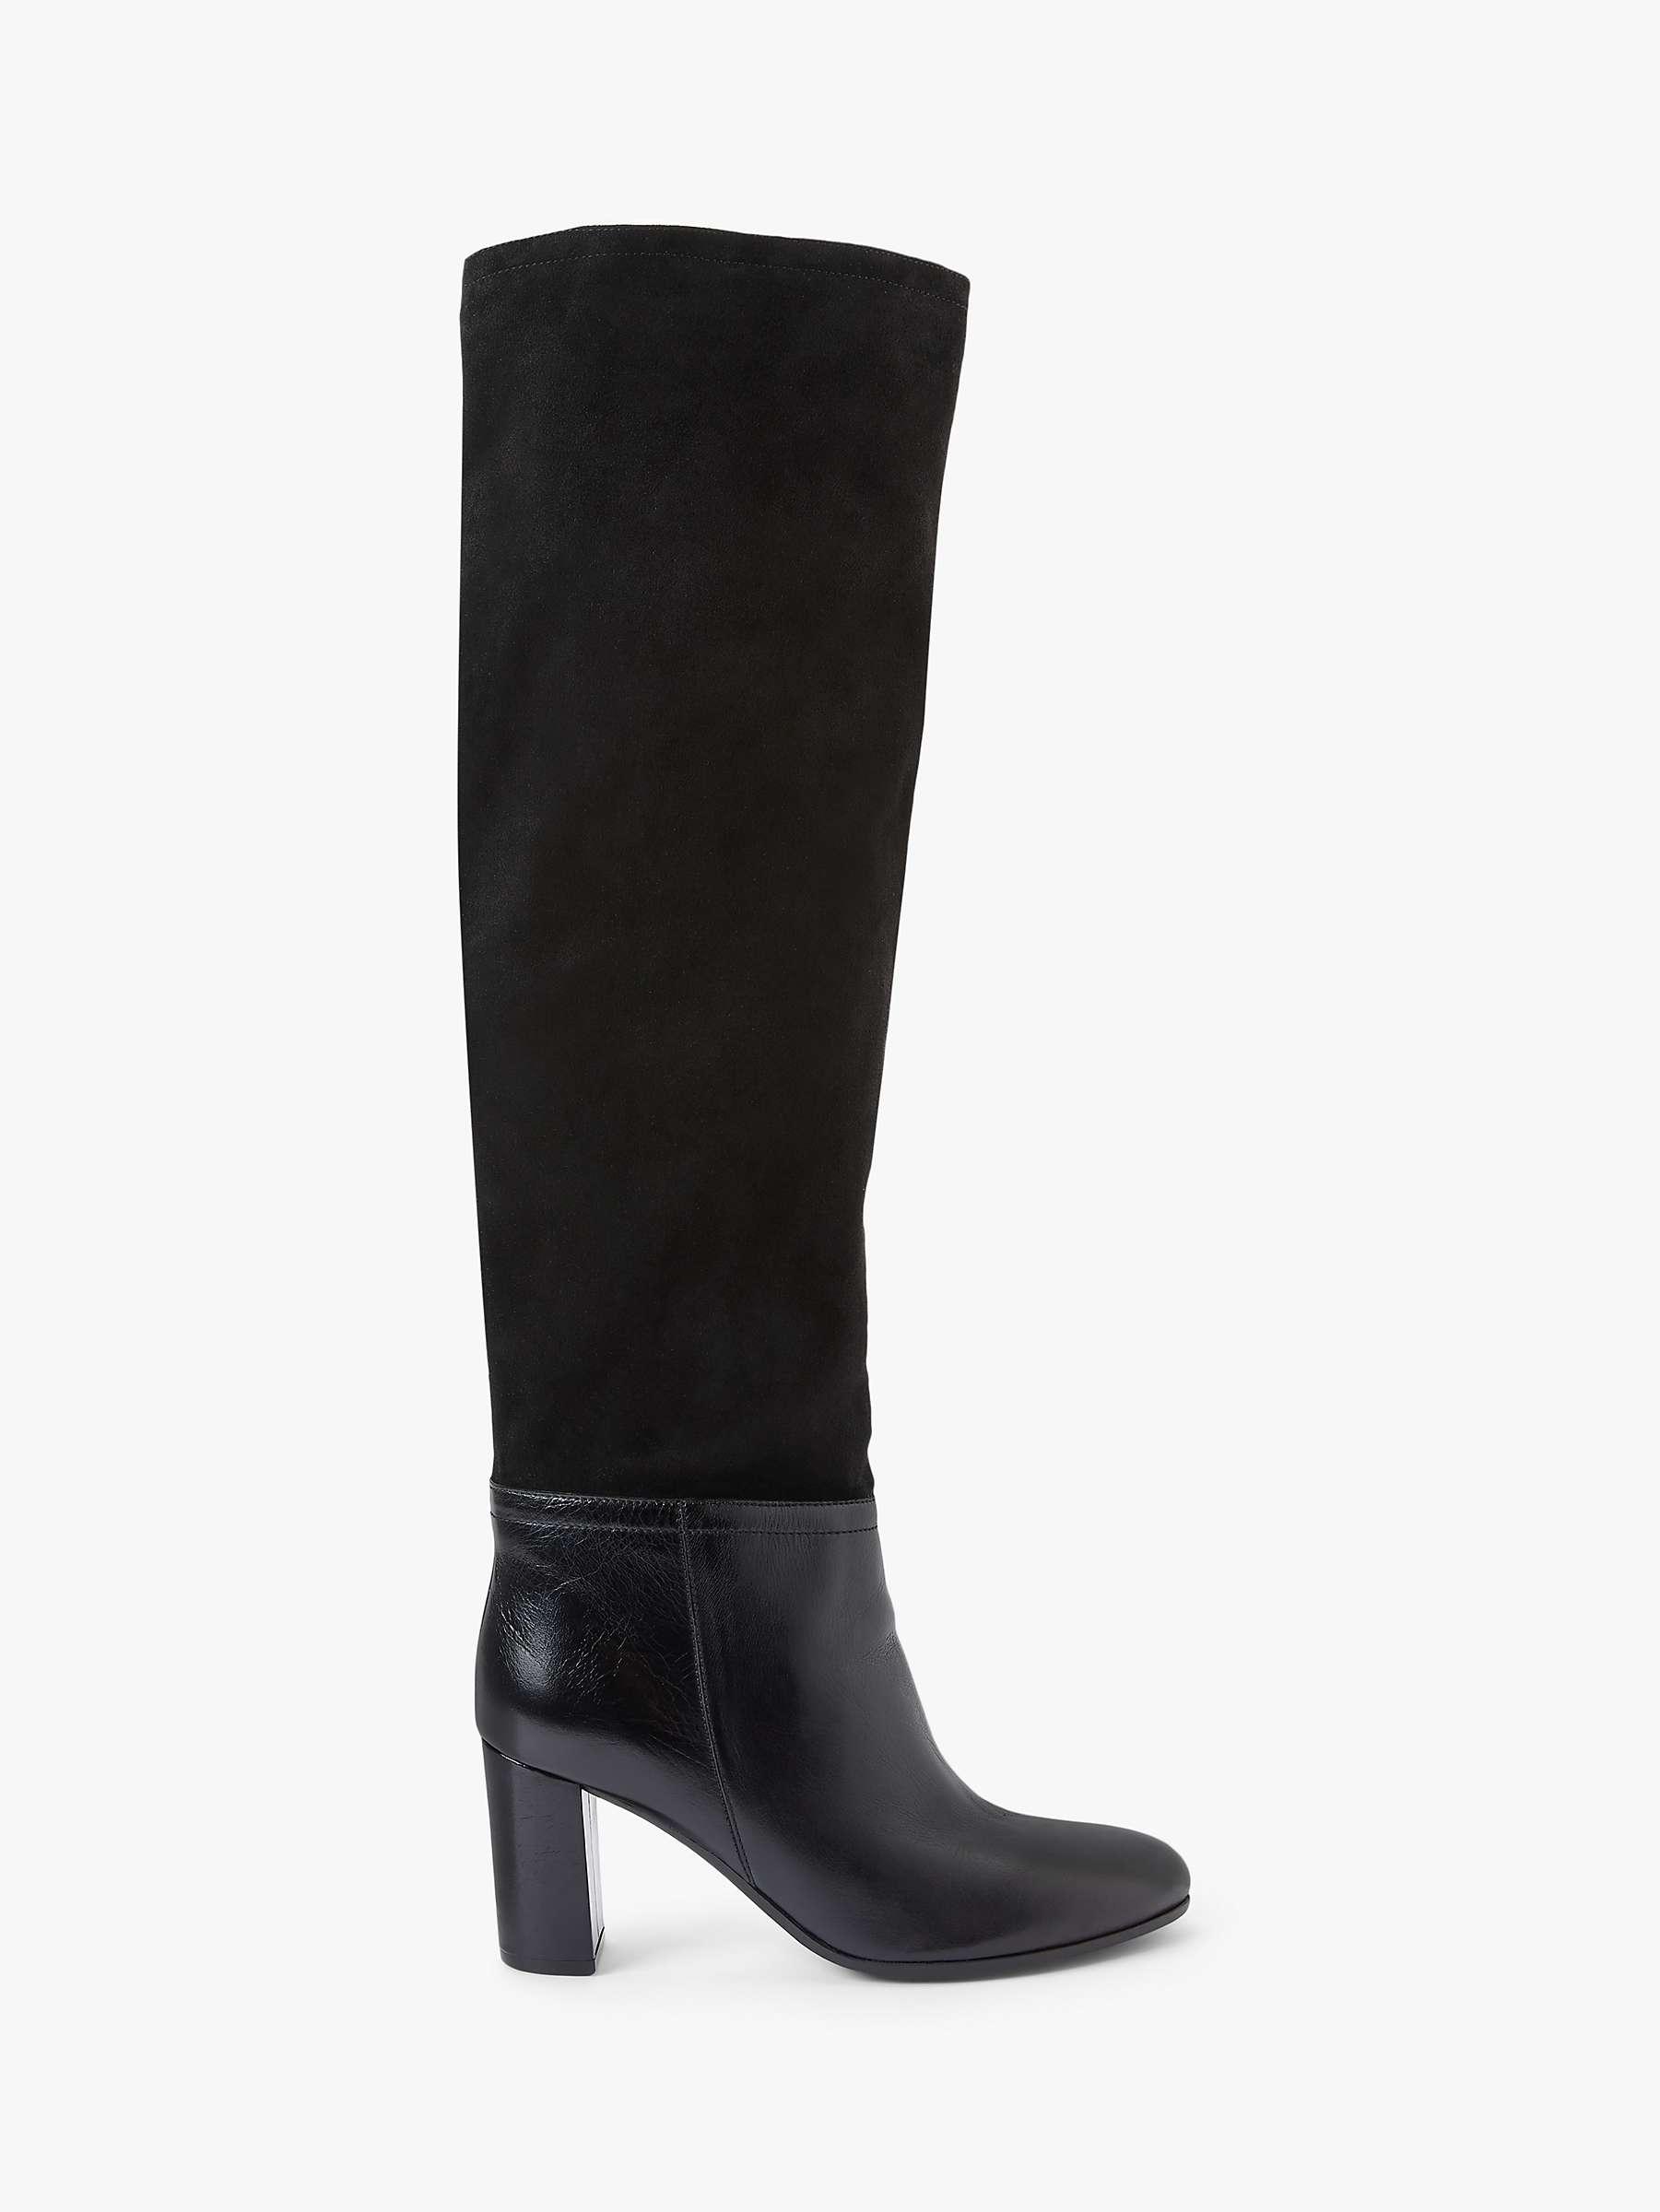 John Lewis & Partners Suri Suede & Leather Knee Boots, Black by John Lewis & Partners